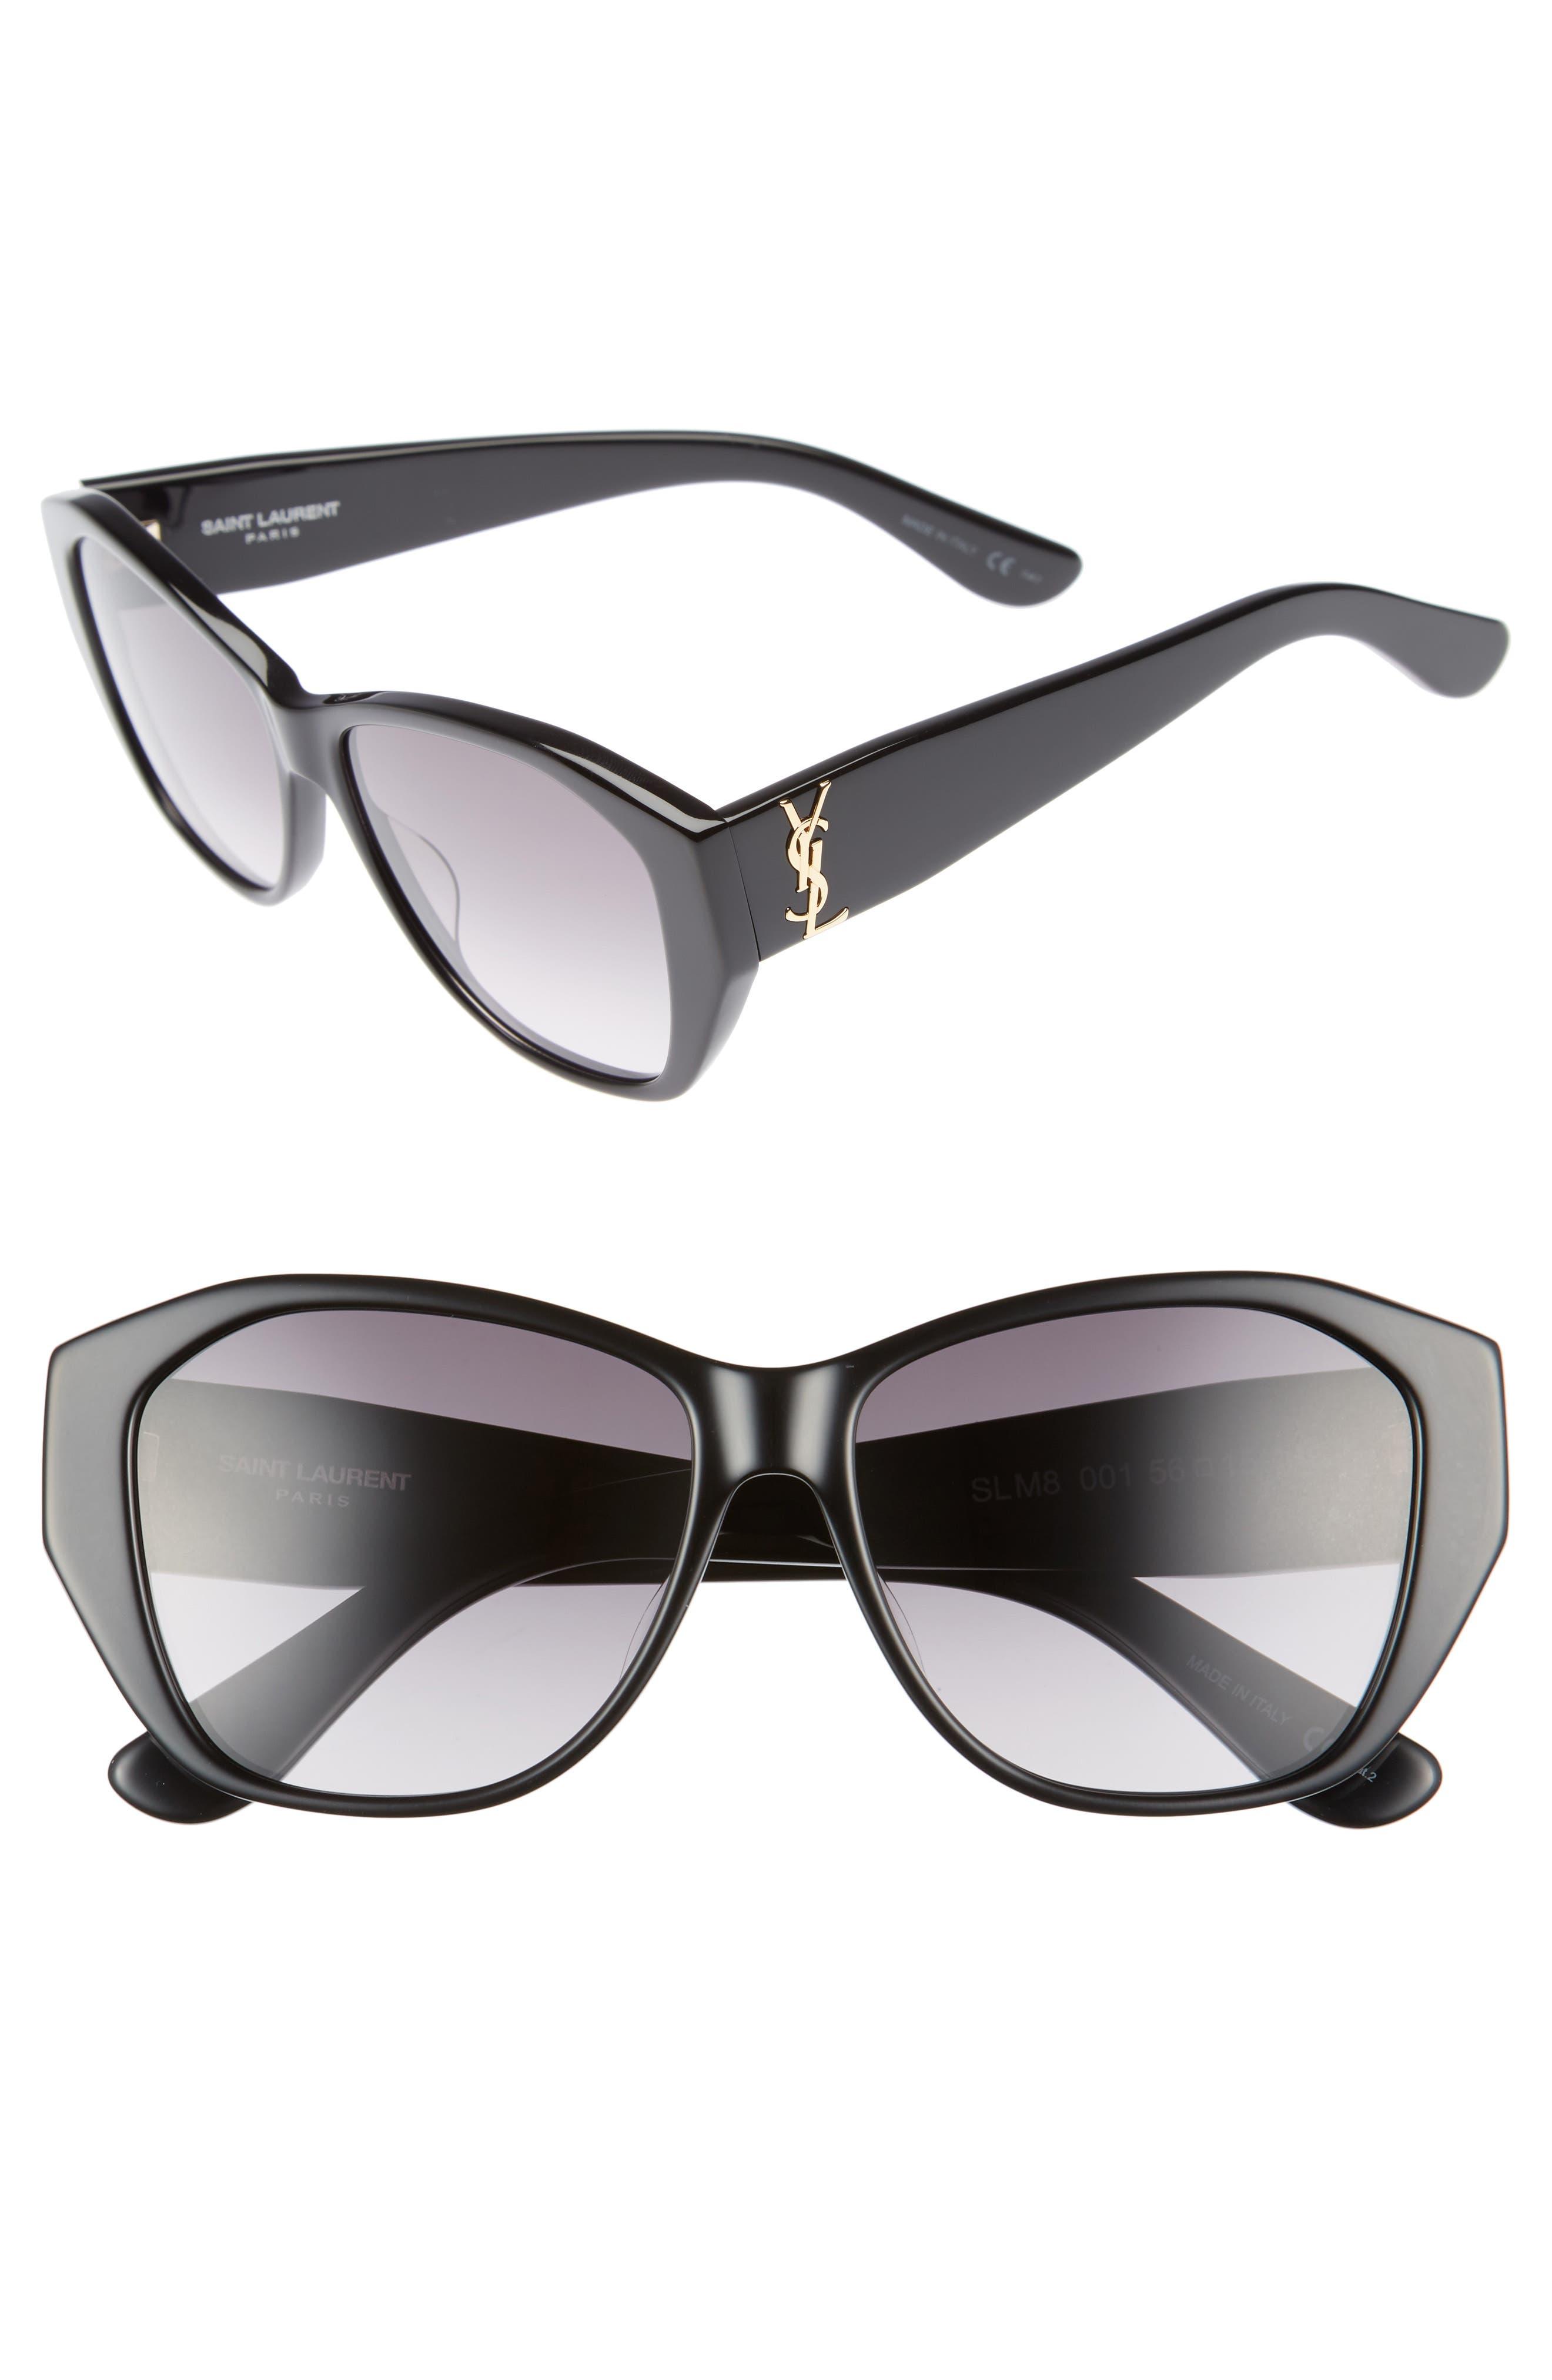 Alternate Image 1 Selected - Saint Laurent 56mm Sunglasses